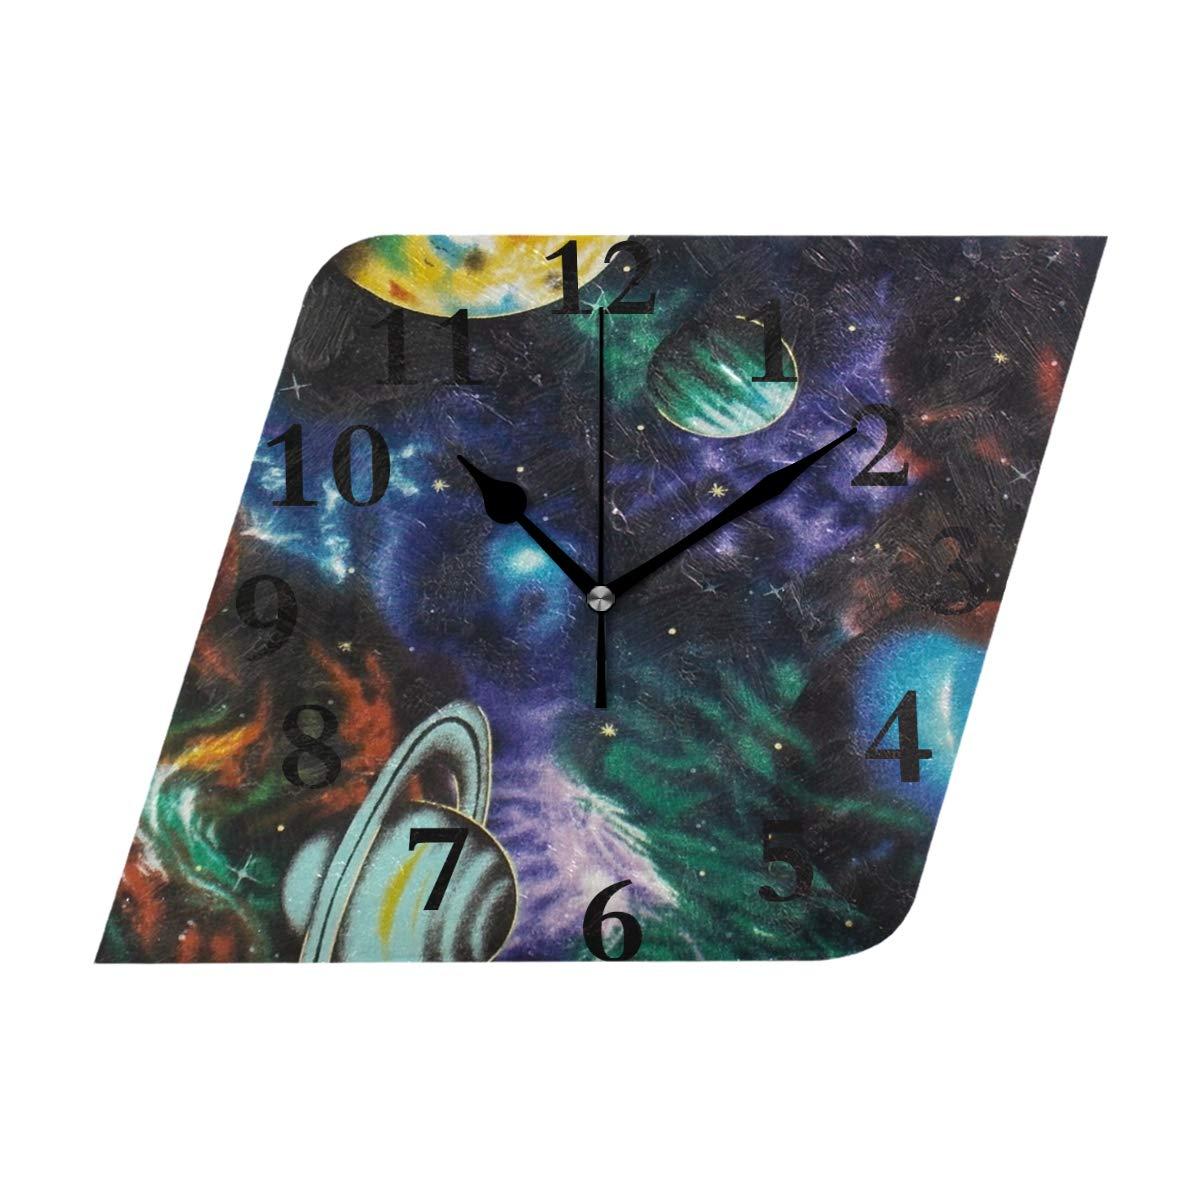 NMCEO Rhombus Wall Clock Galaxy Solar System Acrylic Silent Non-Ticking for Home Decor Creative